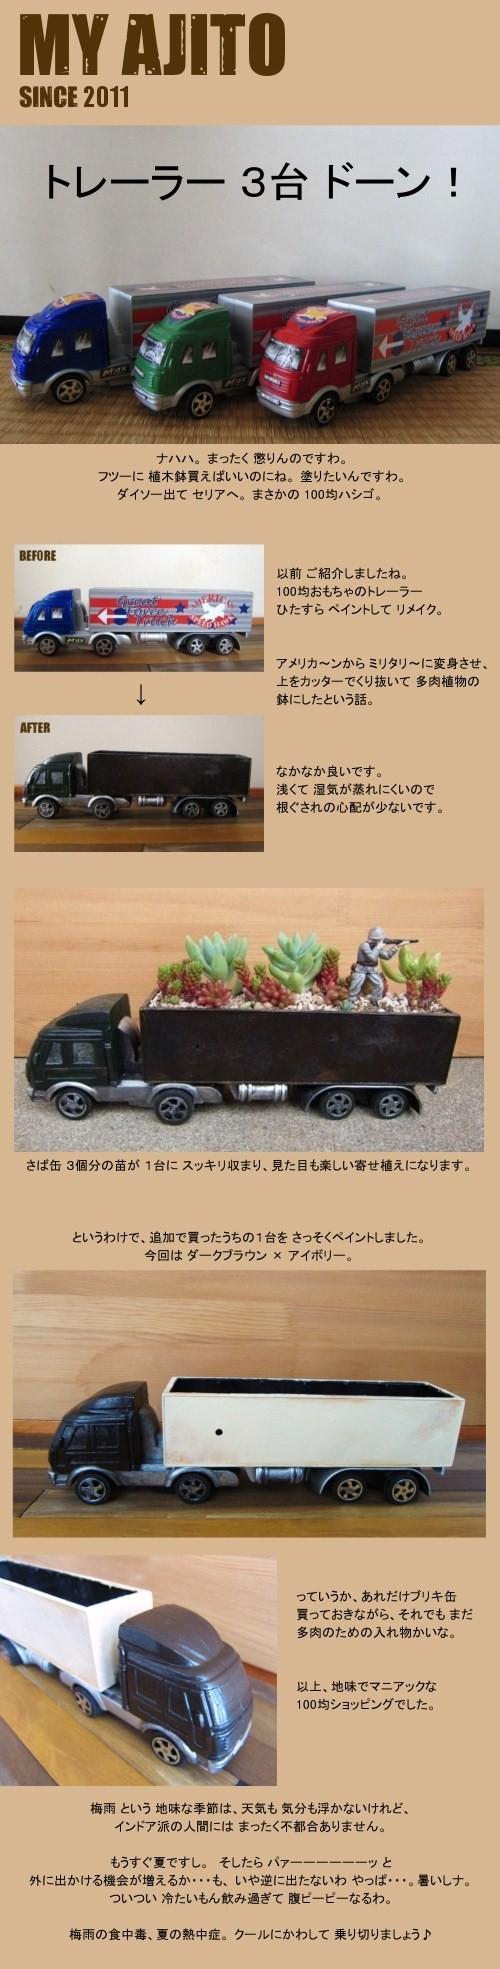 TSUYU_4.jpg